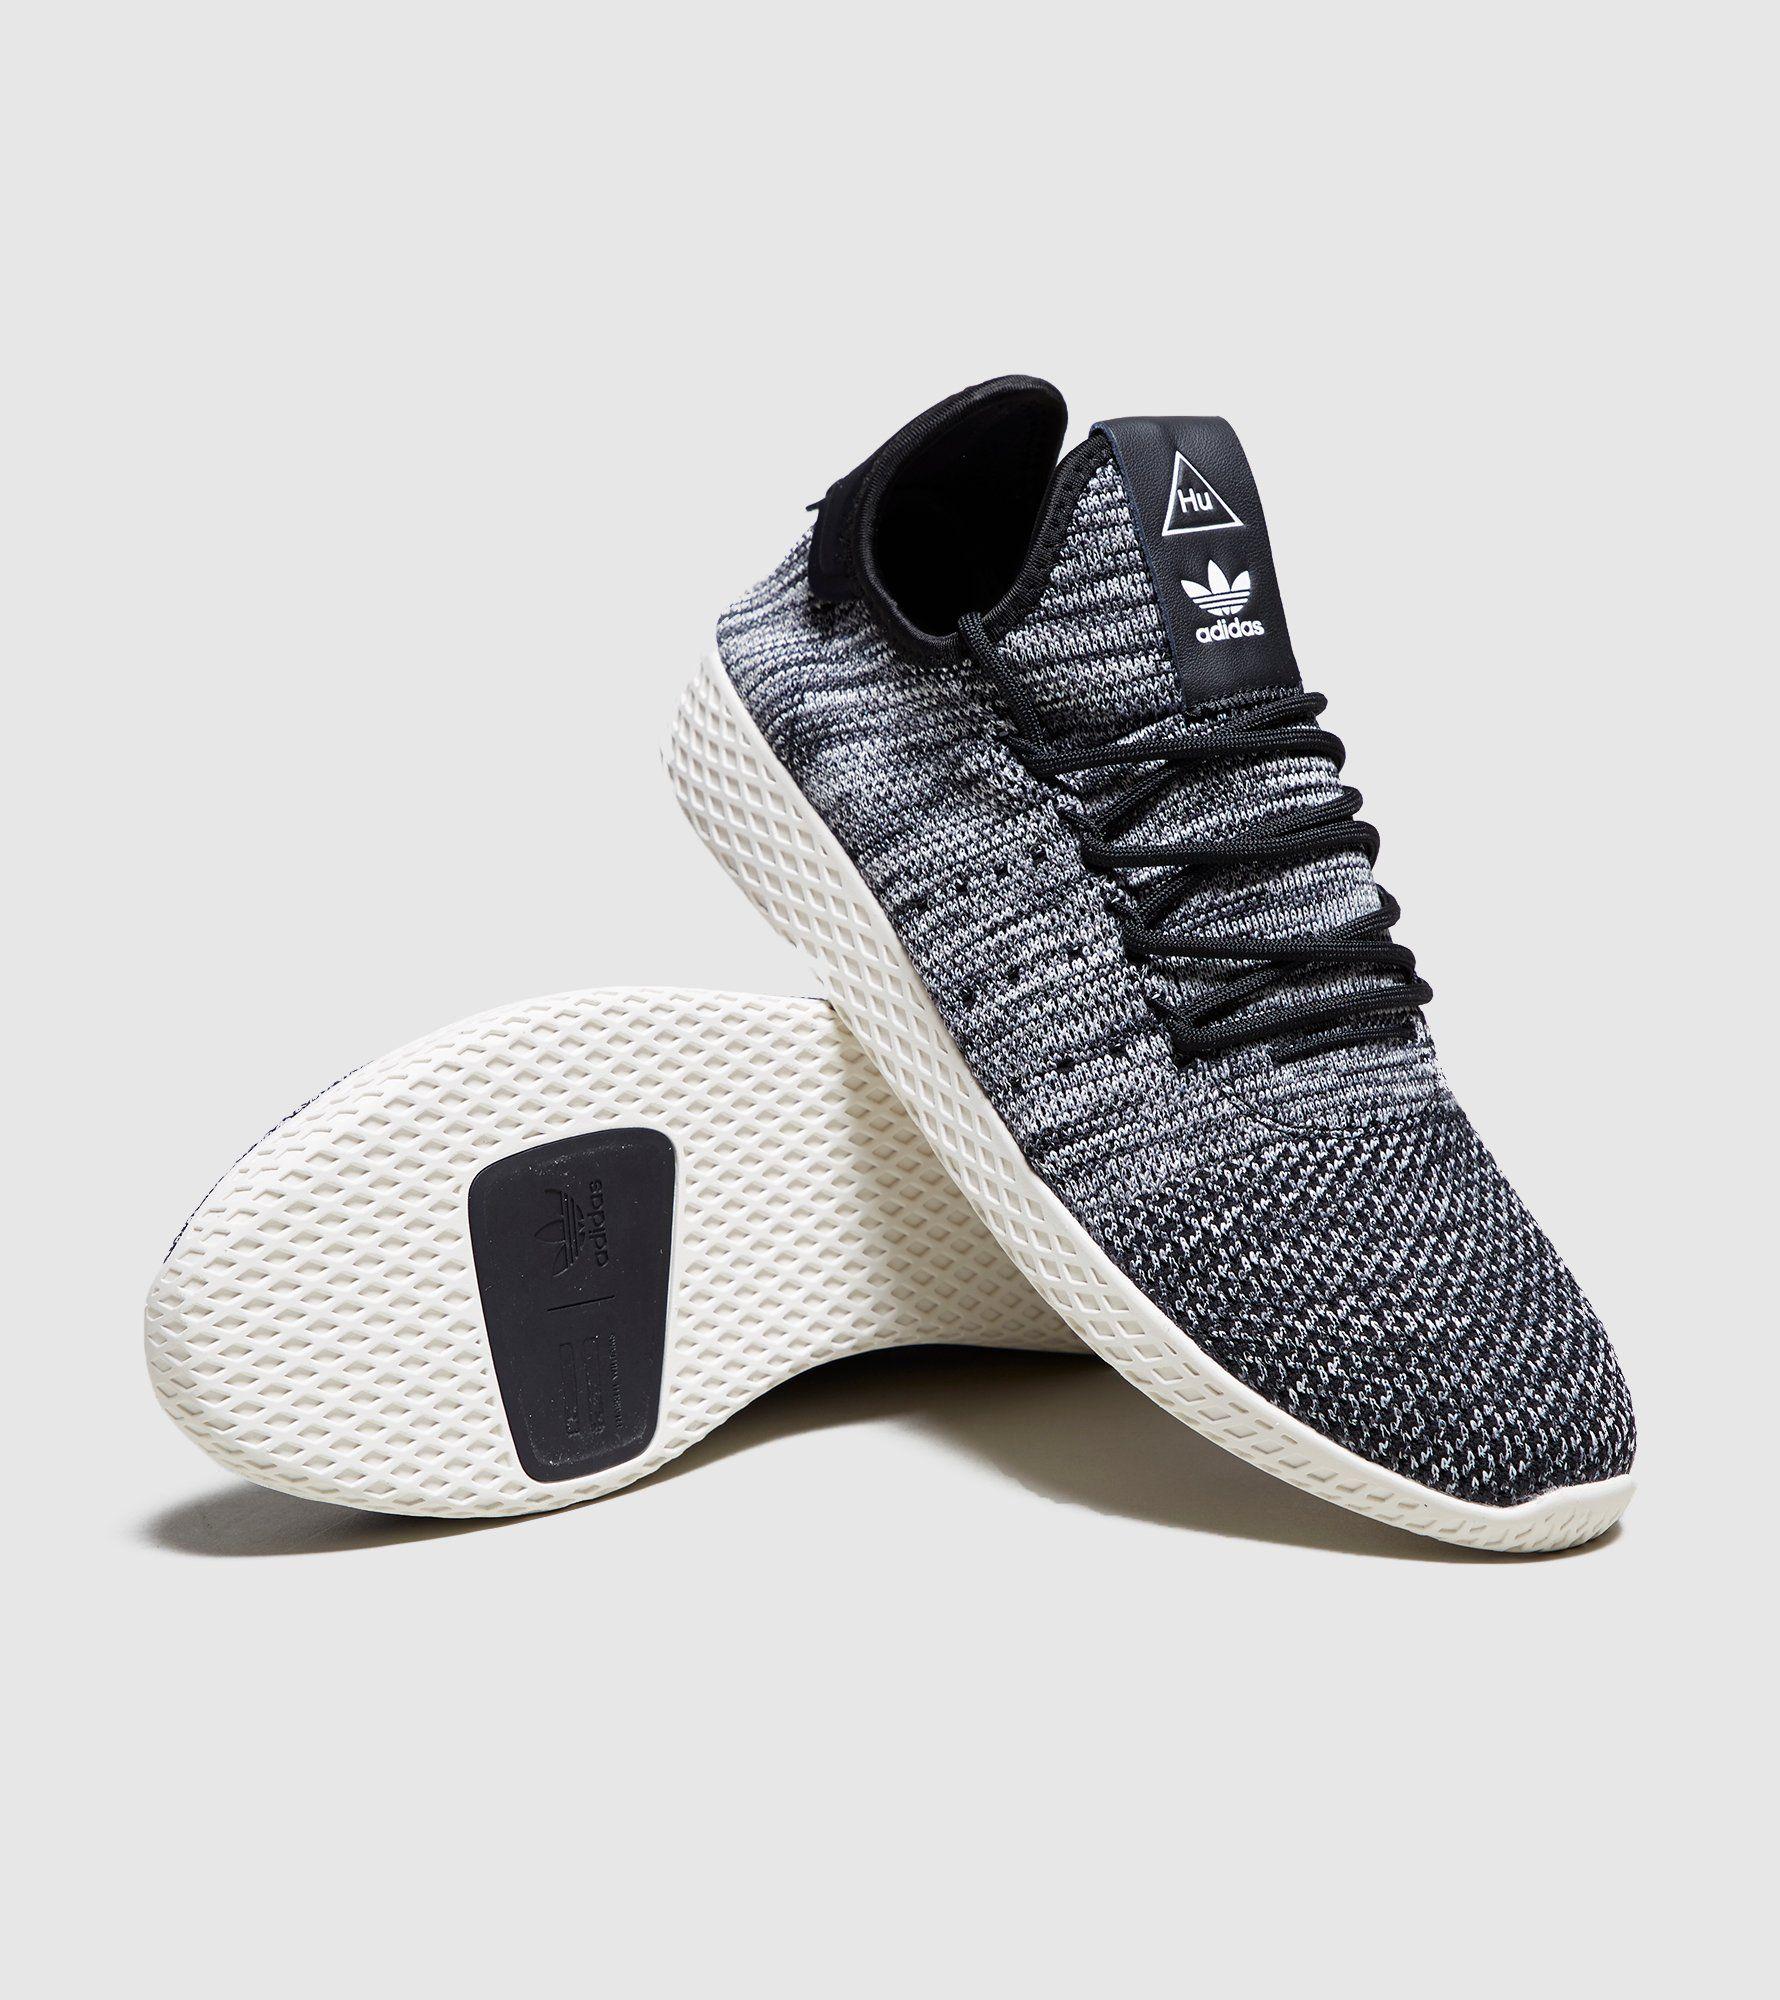 adidas Chaussure Pharrell Williams Tennis Hu Primeknit